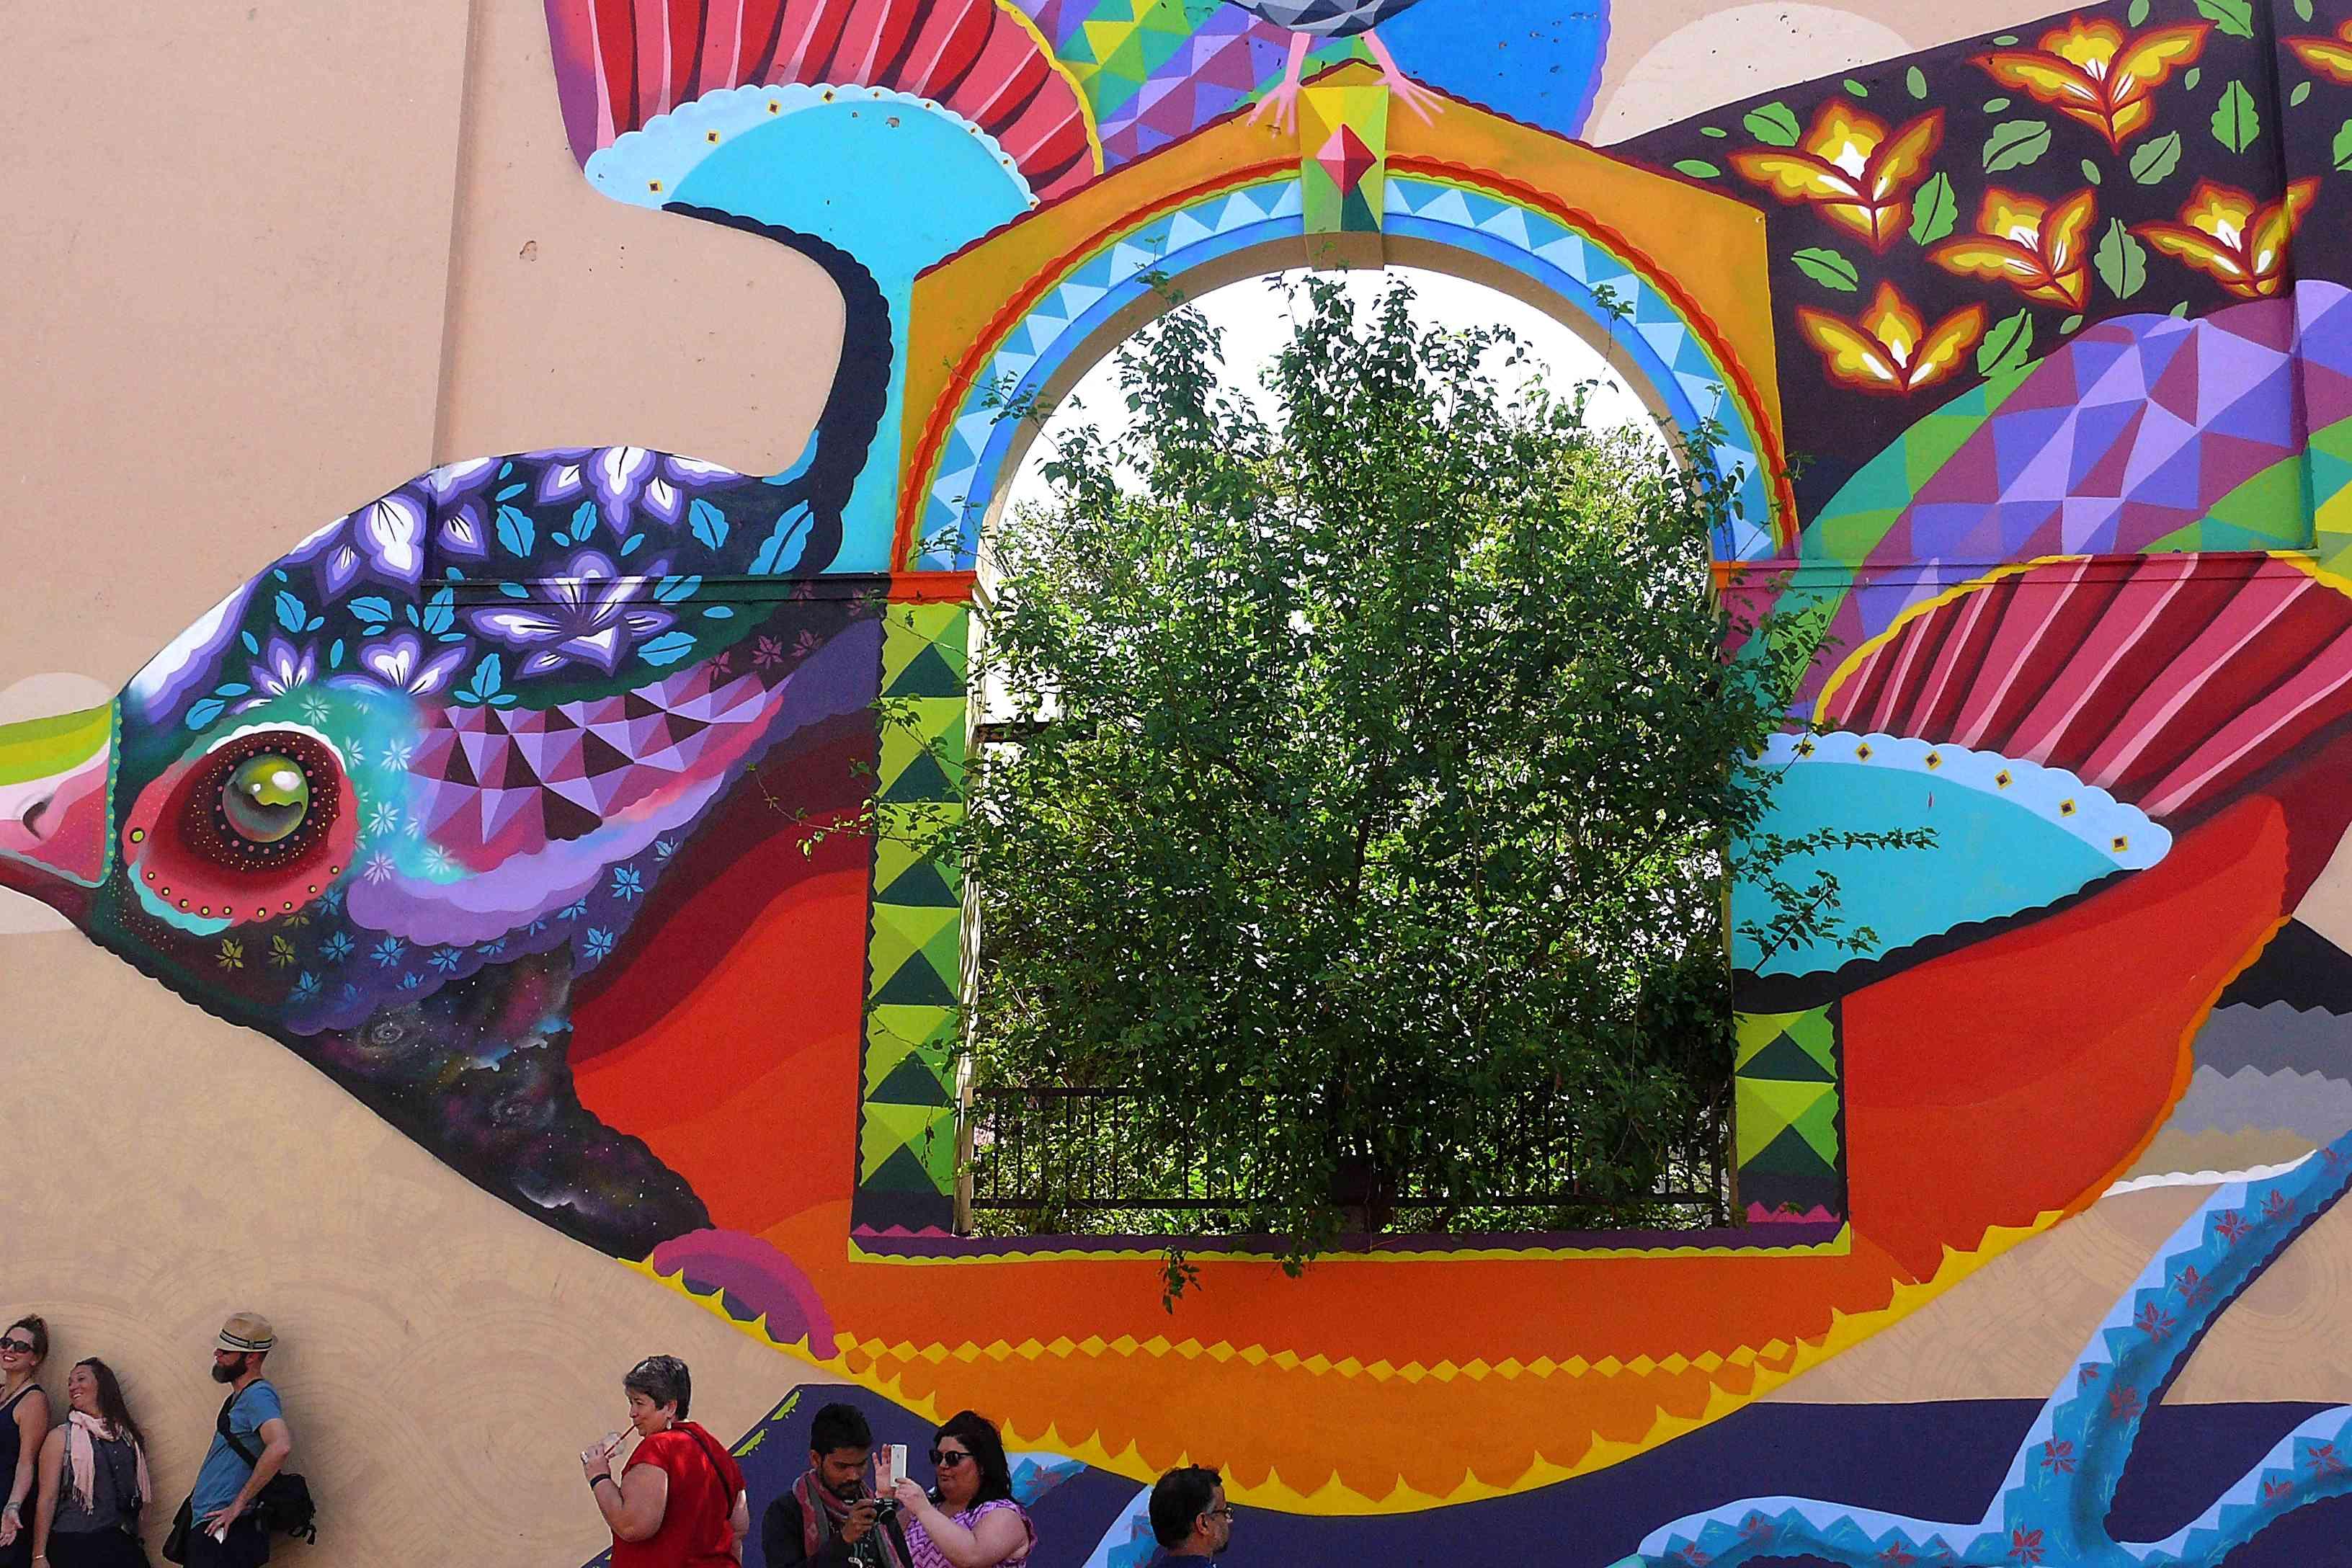 Street Art Walking Tour, Shahpur Jat